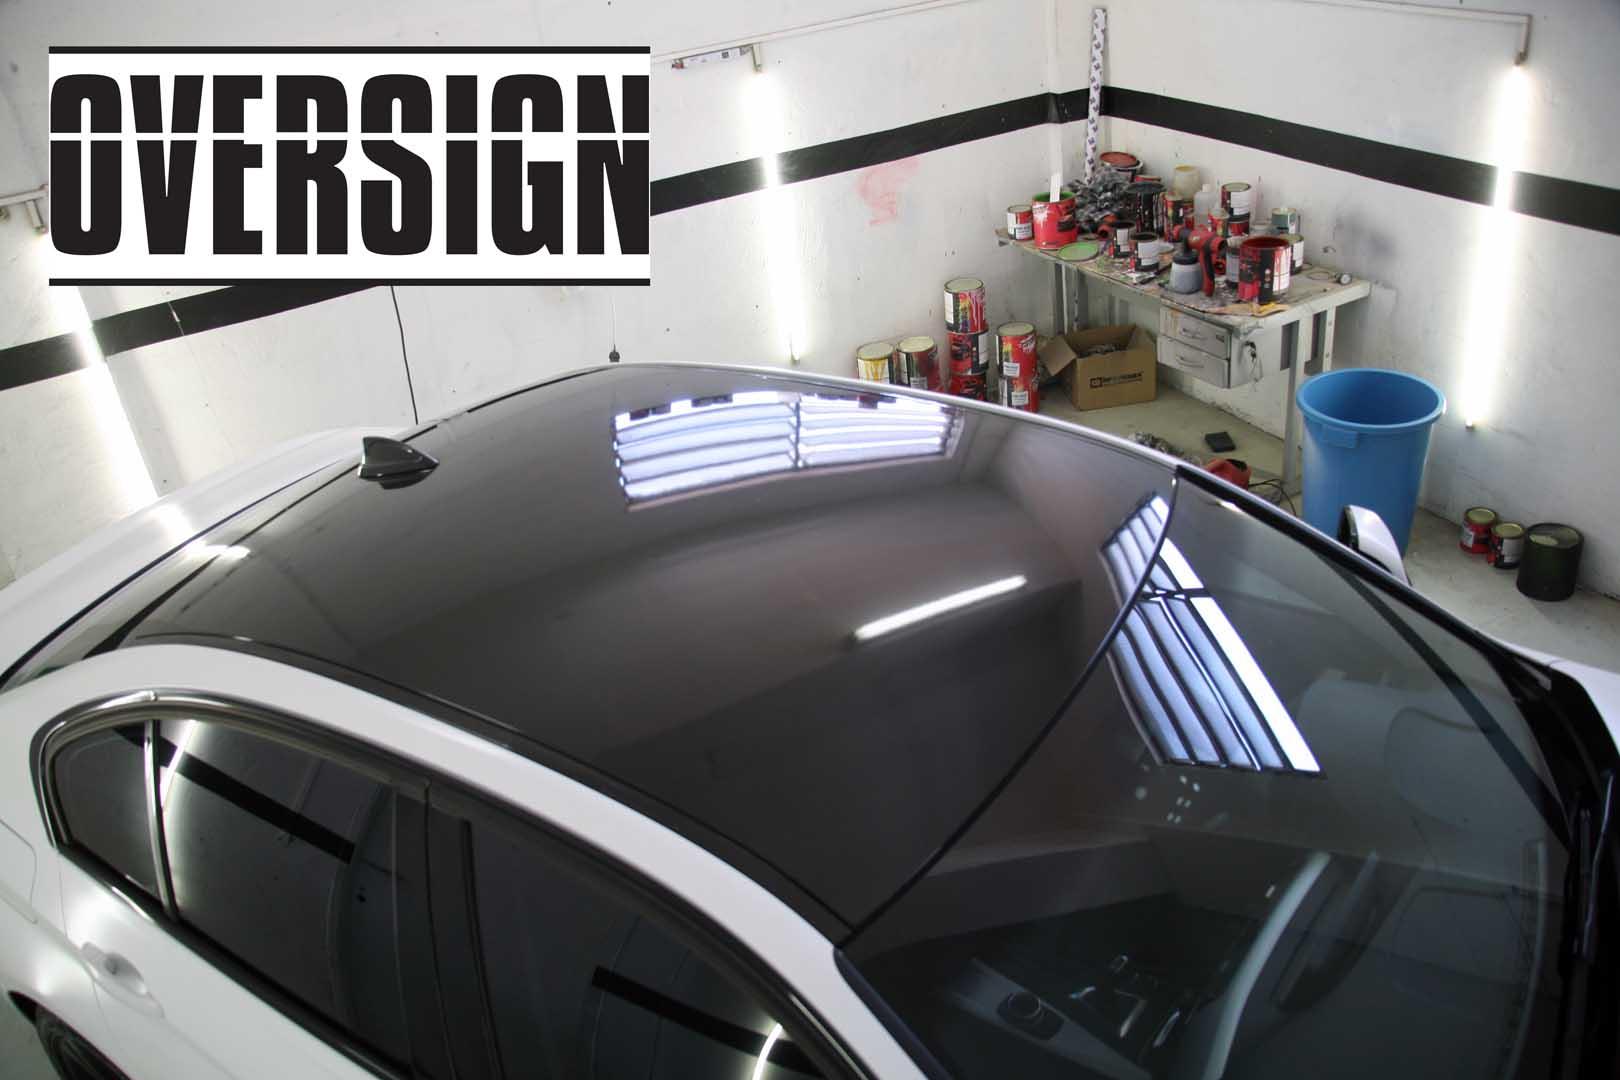 Teto Black Piano Para Carros Piano Black Roof For Cars